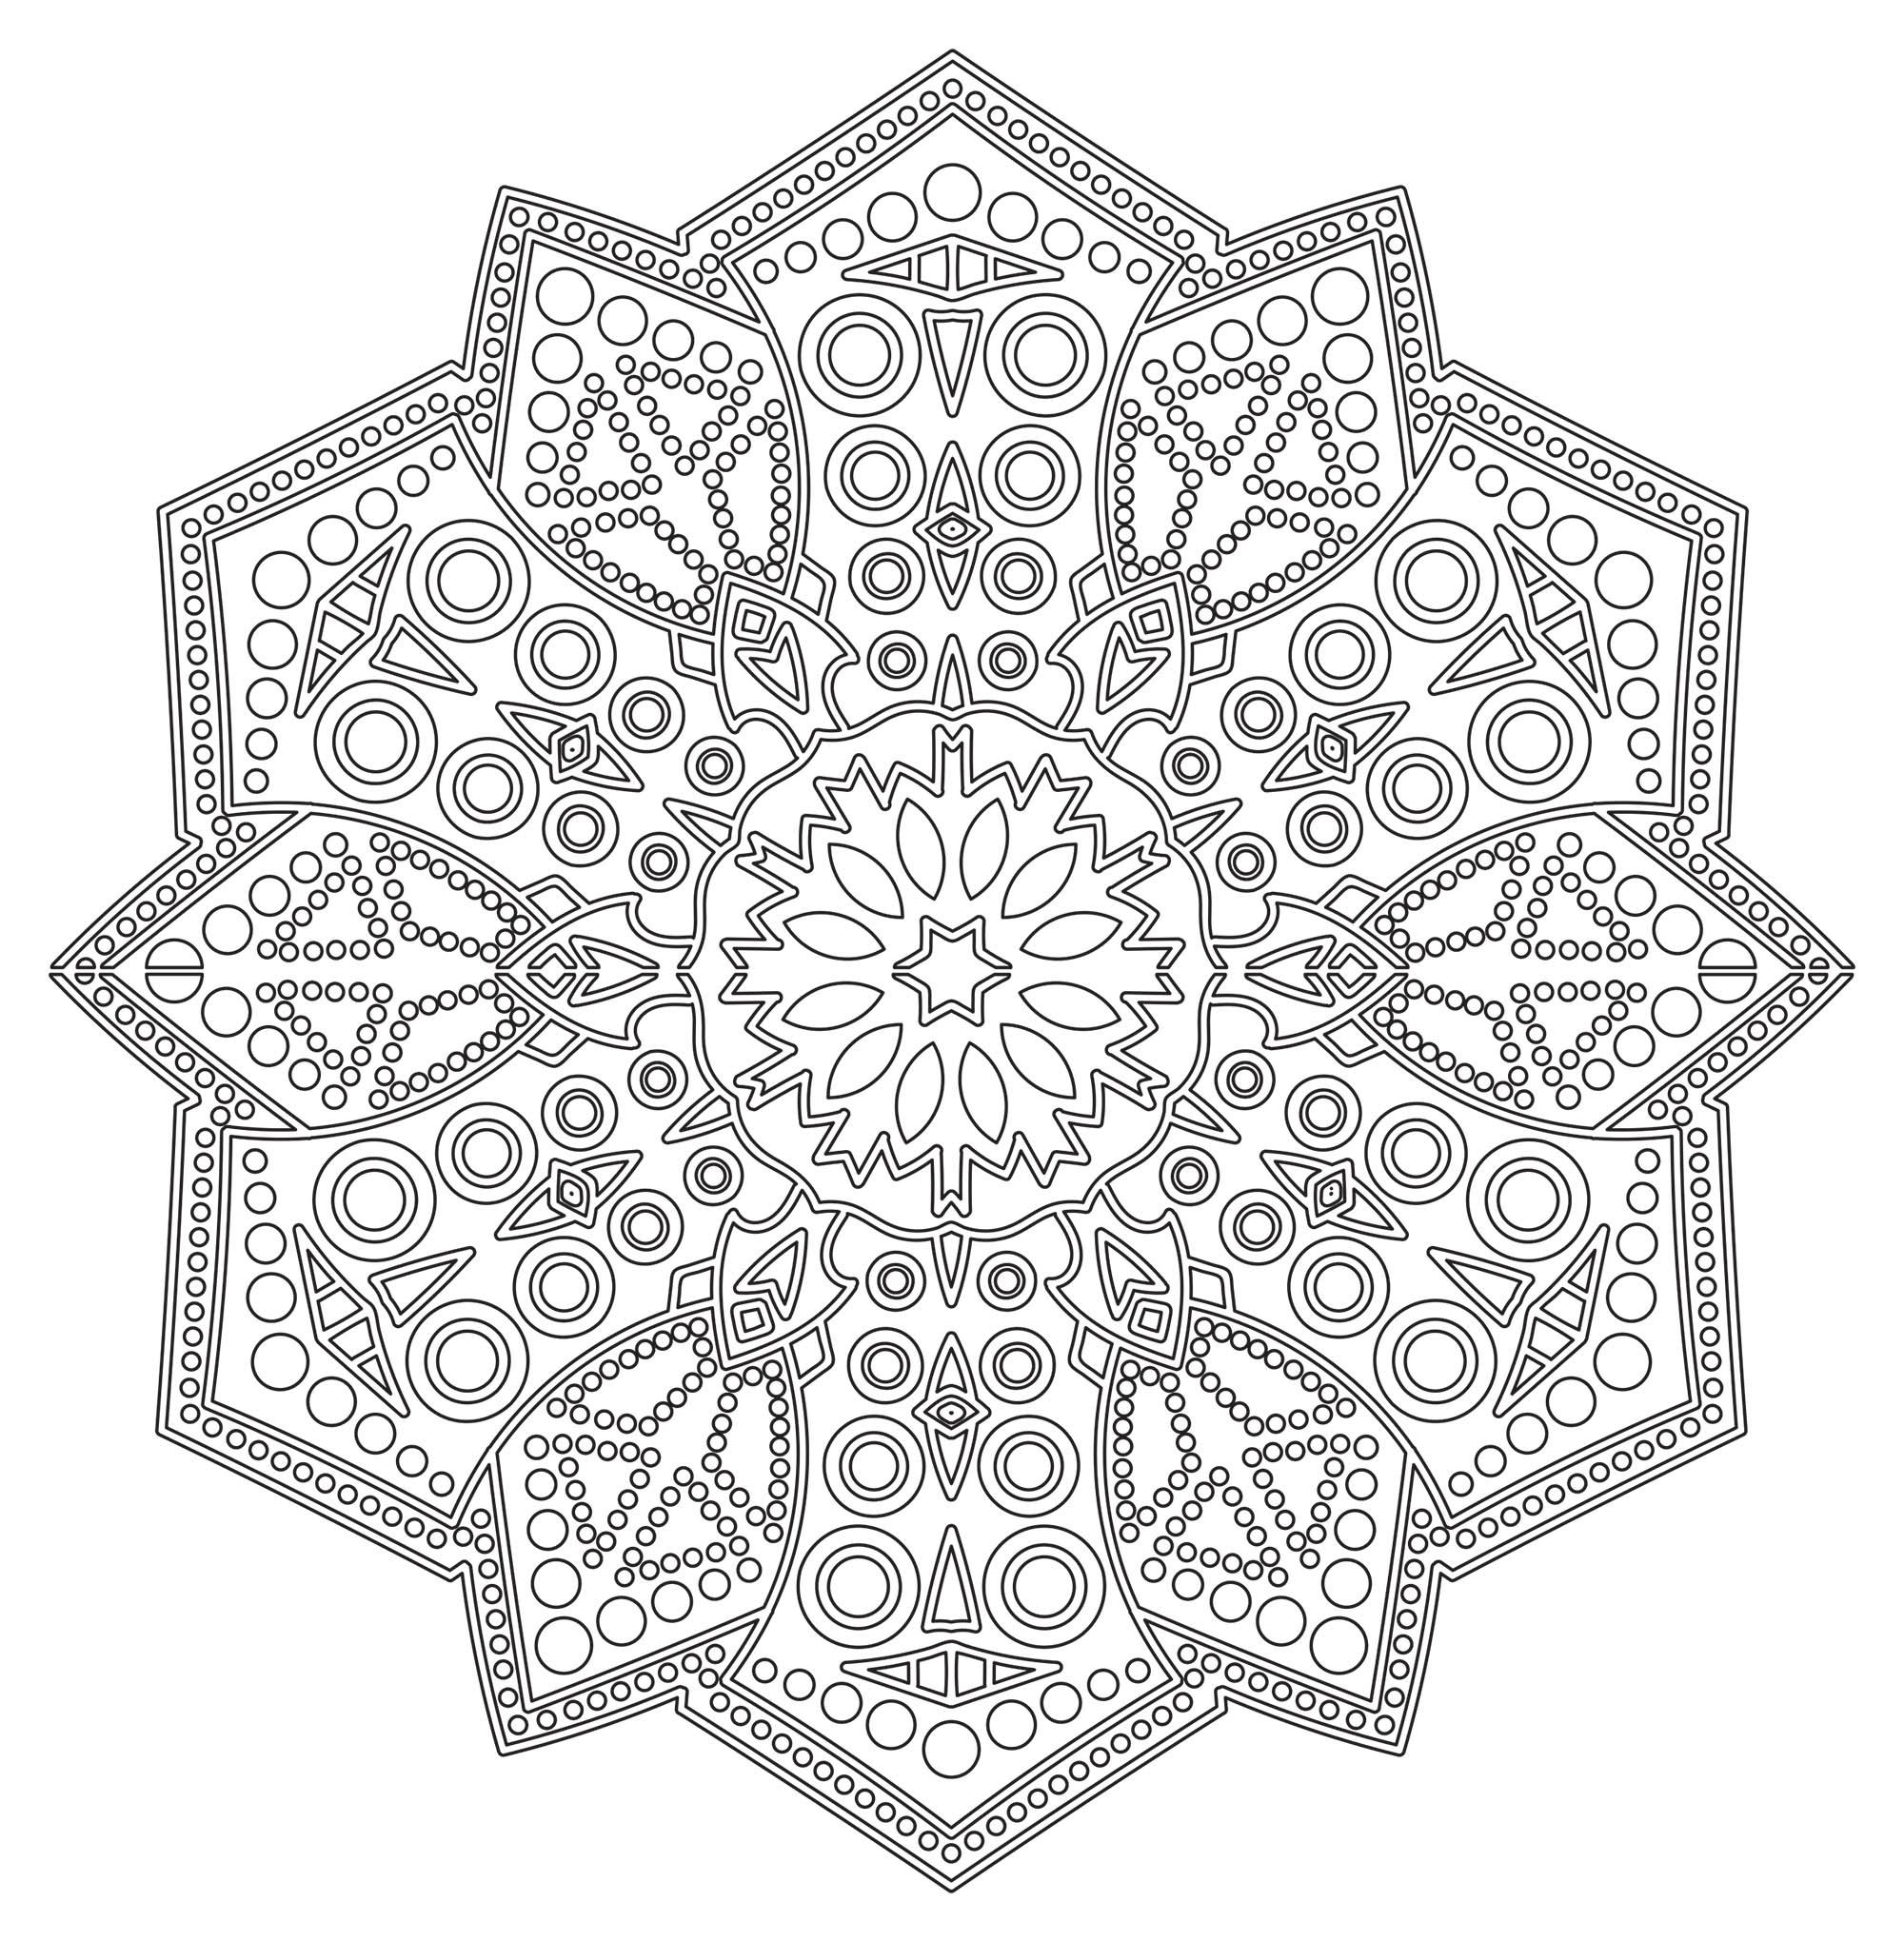 Mandala zen antistress 6 mandalas coloriages difficiles pour adultes - Dessin anti stress mandala ...